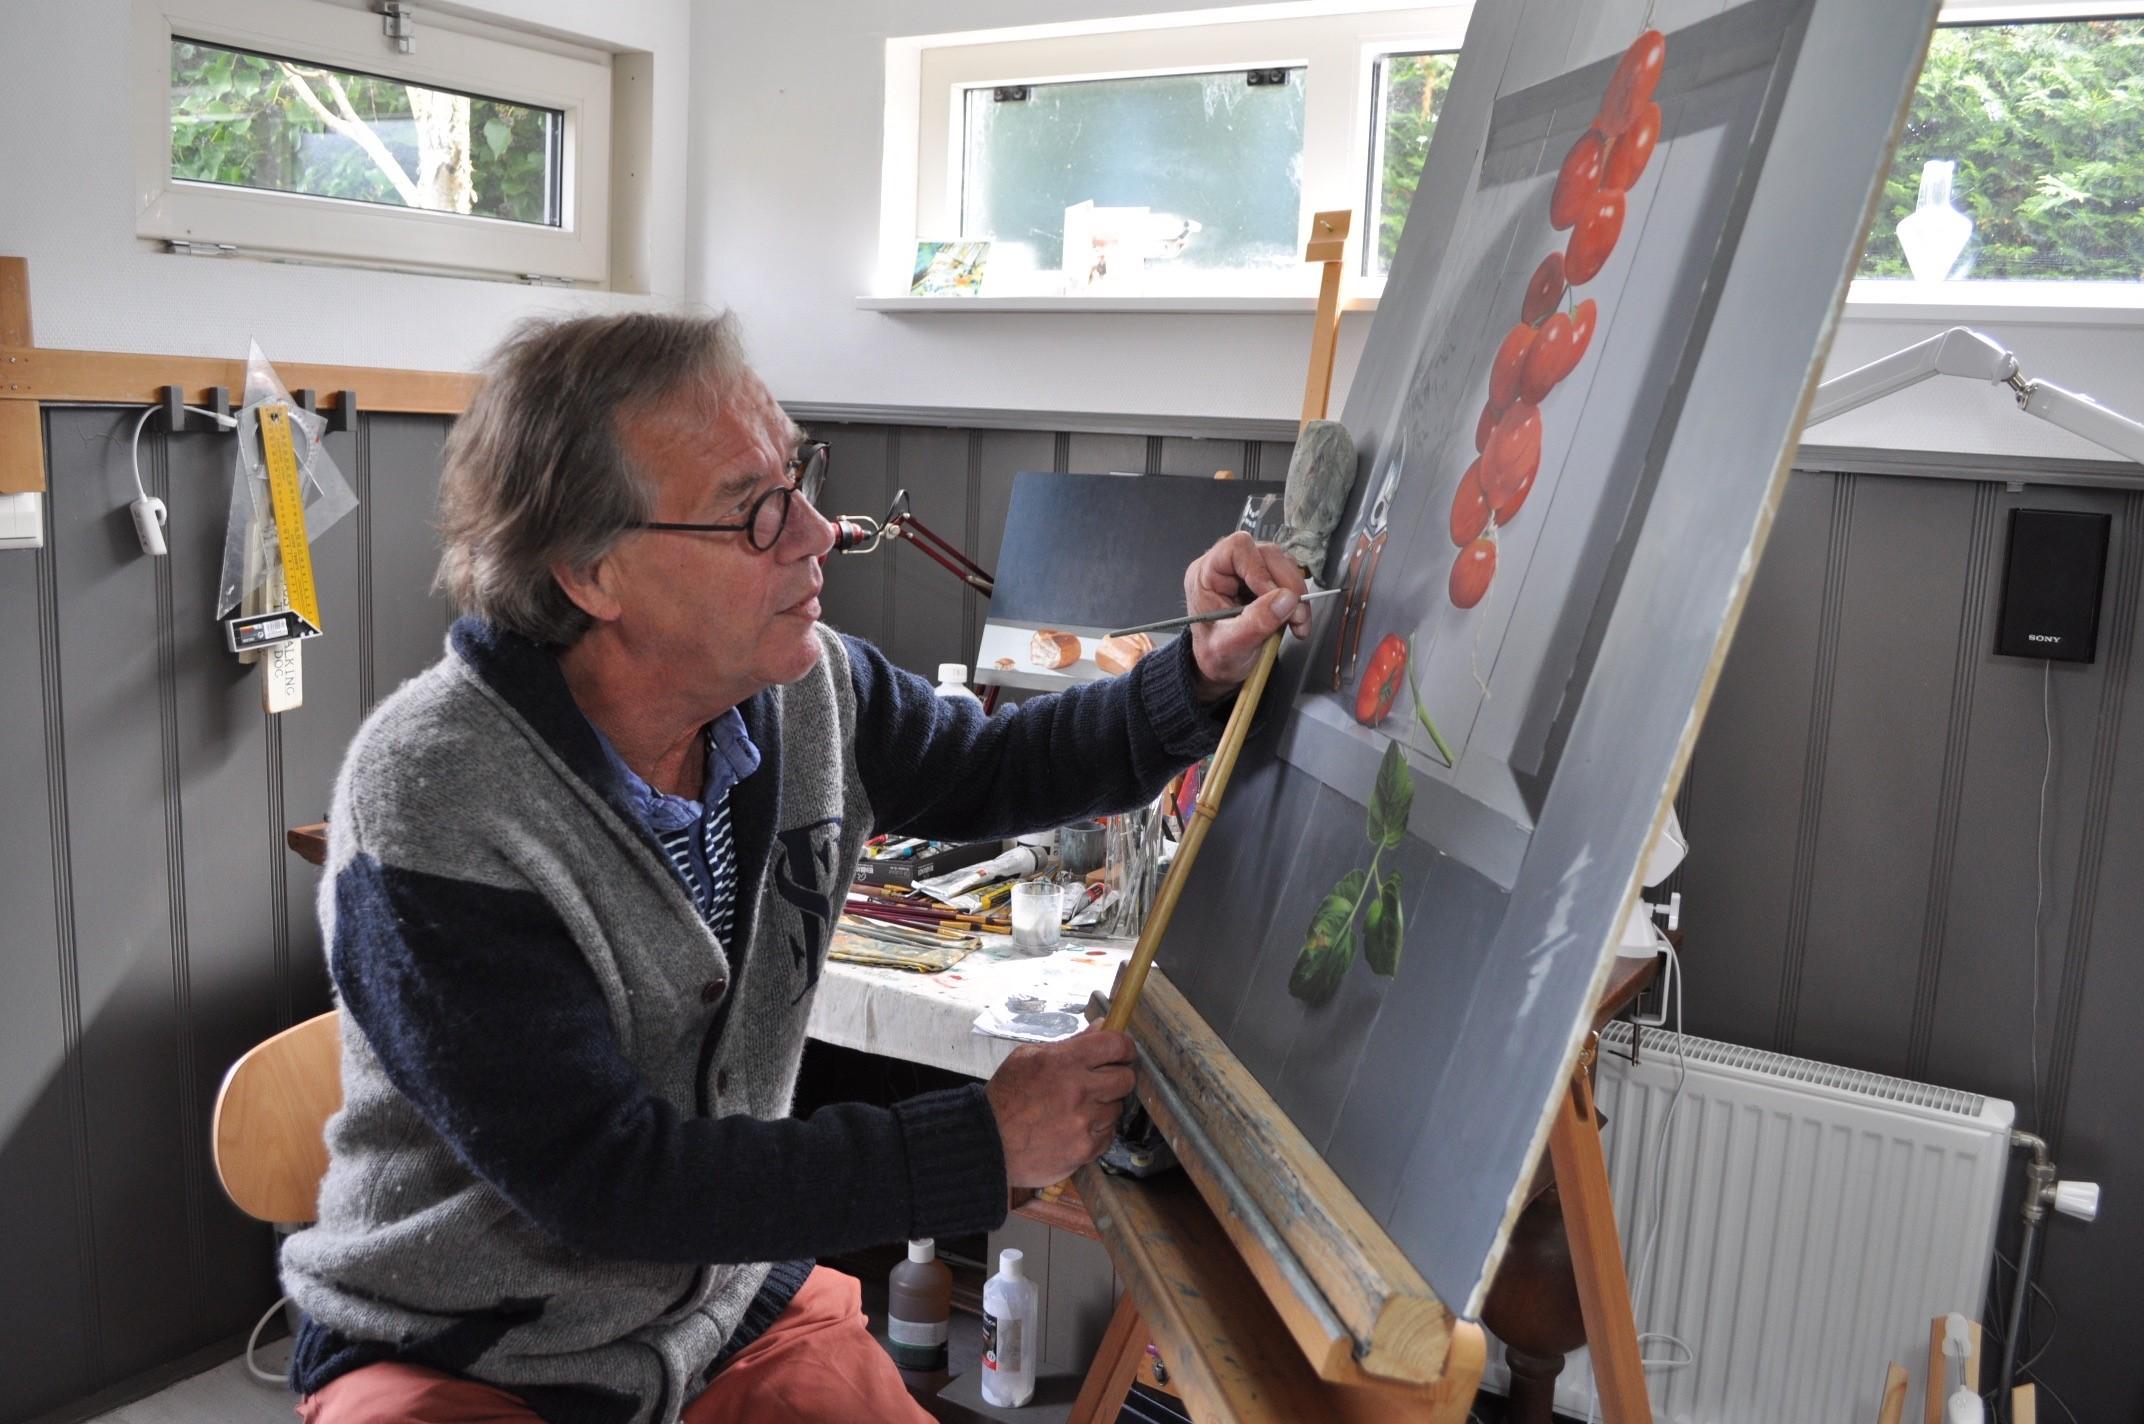 Stillevenschilder Martijn Weiffenbach aan het werk. (Foto: aangeleverd)